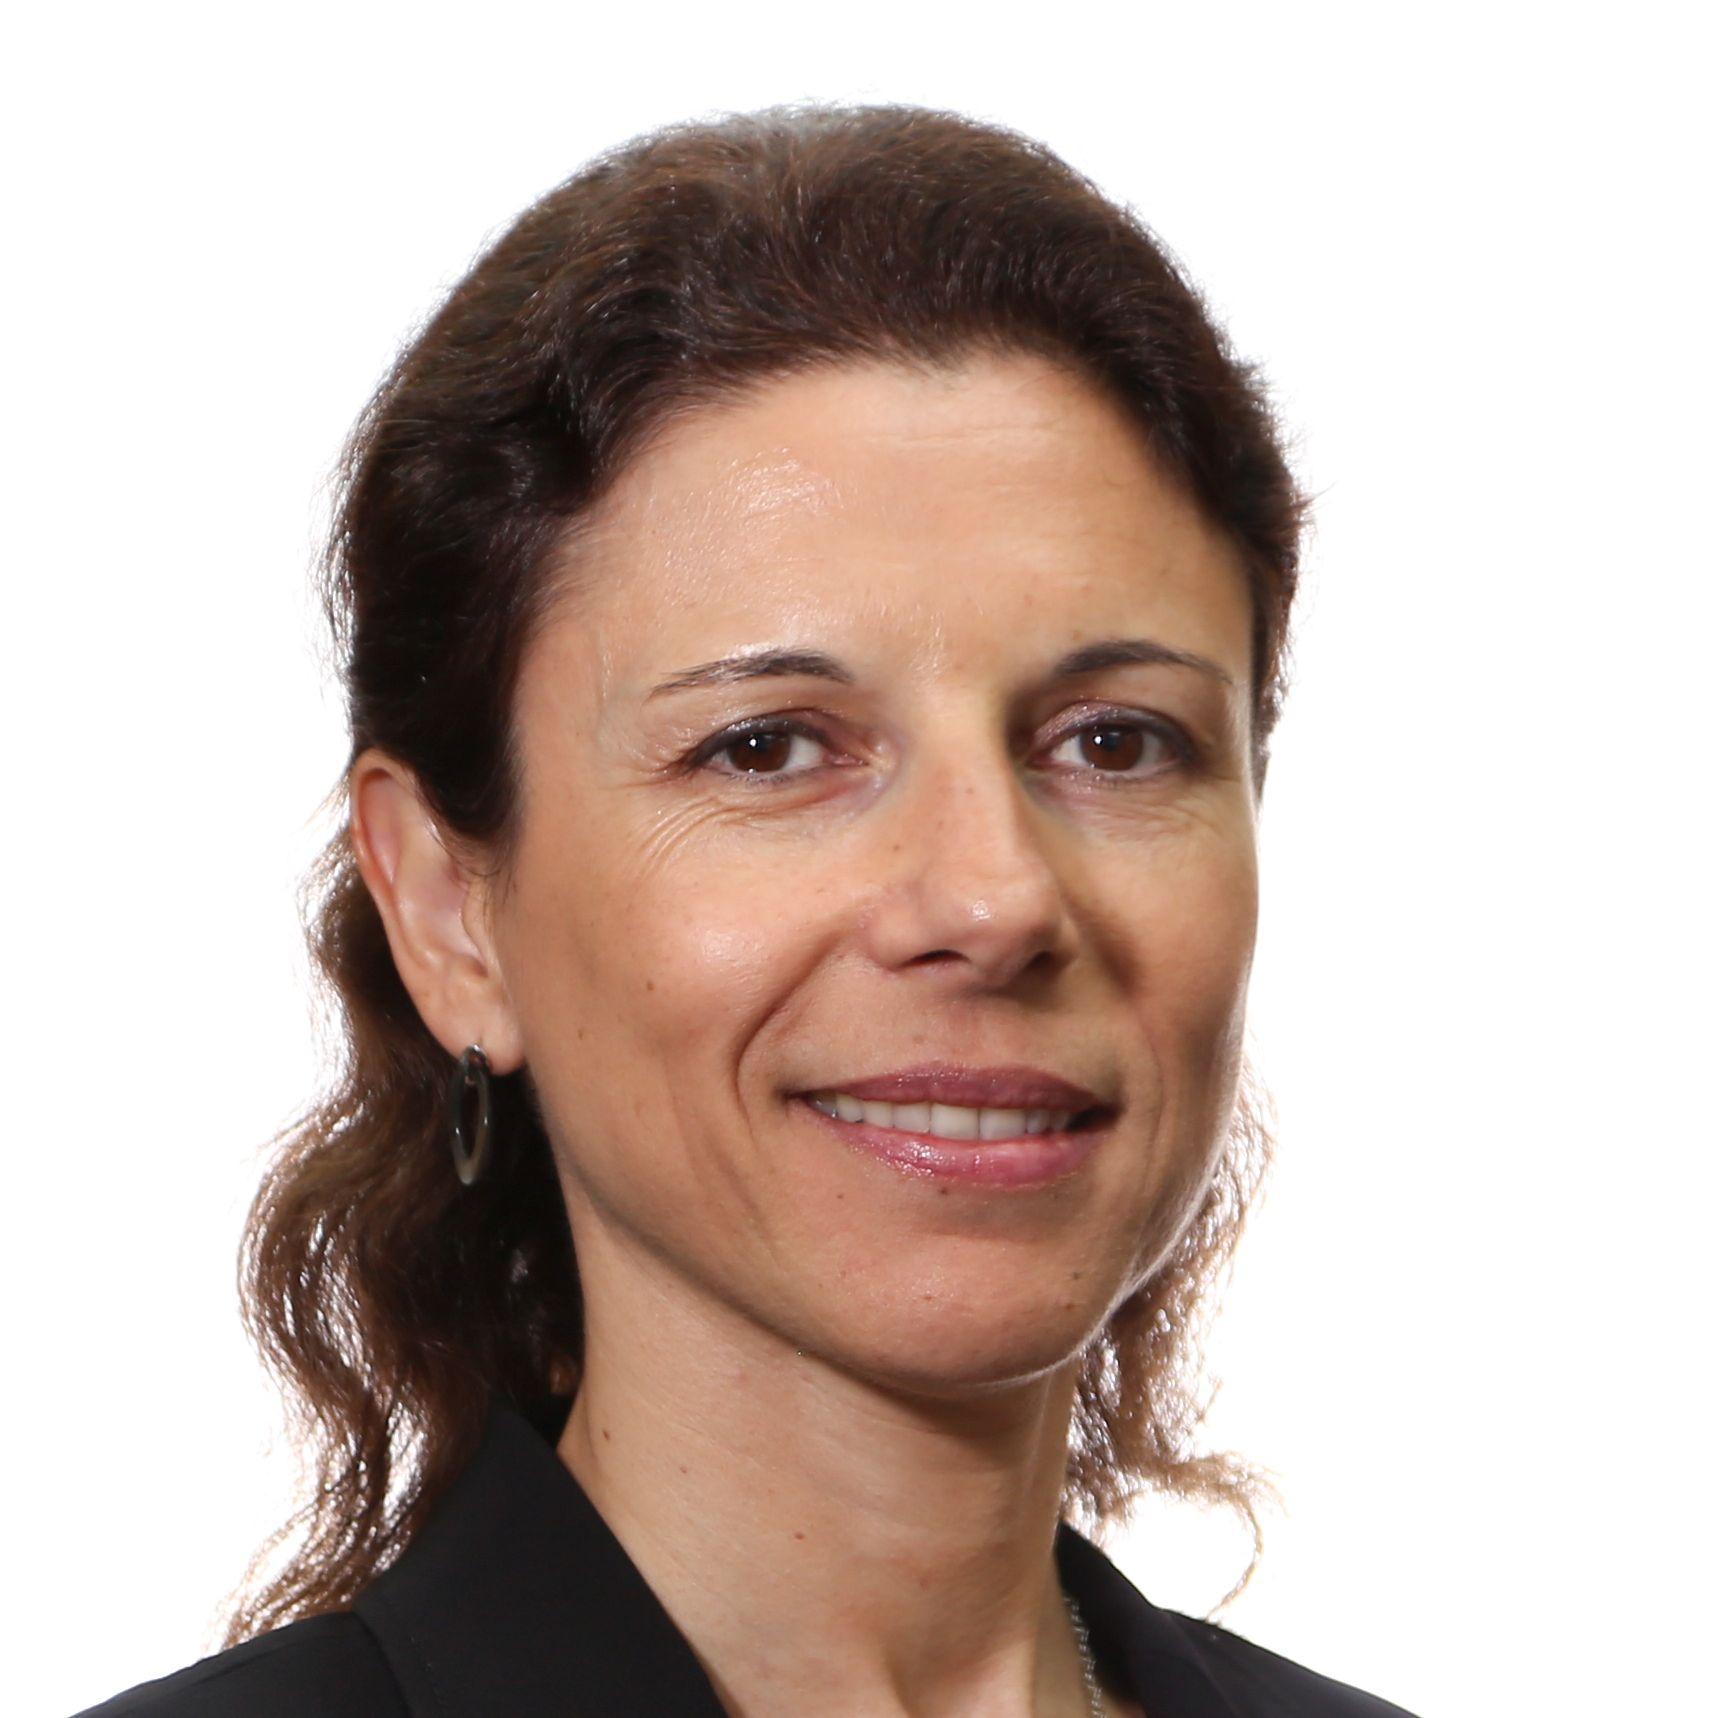 Christelle Labbe